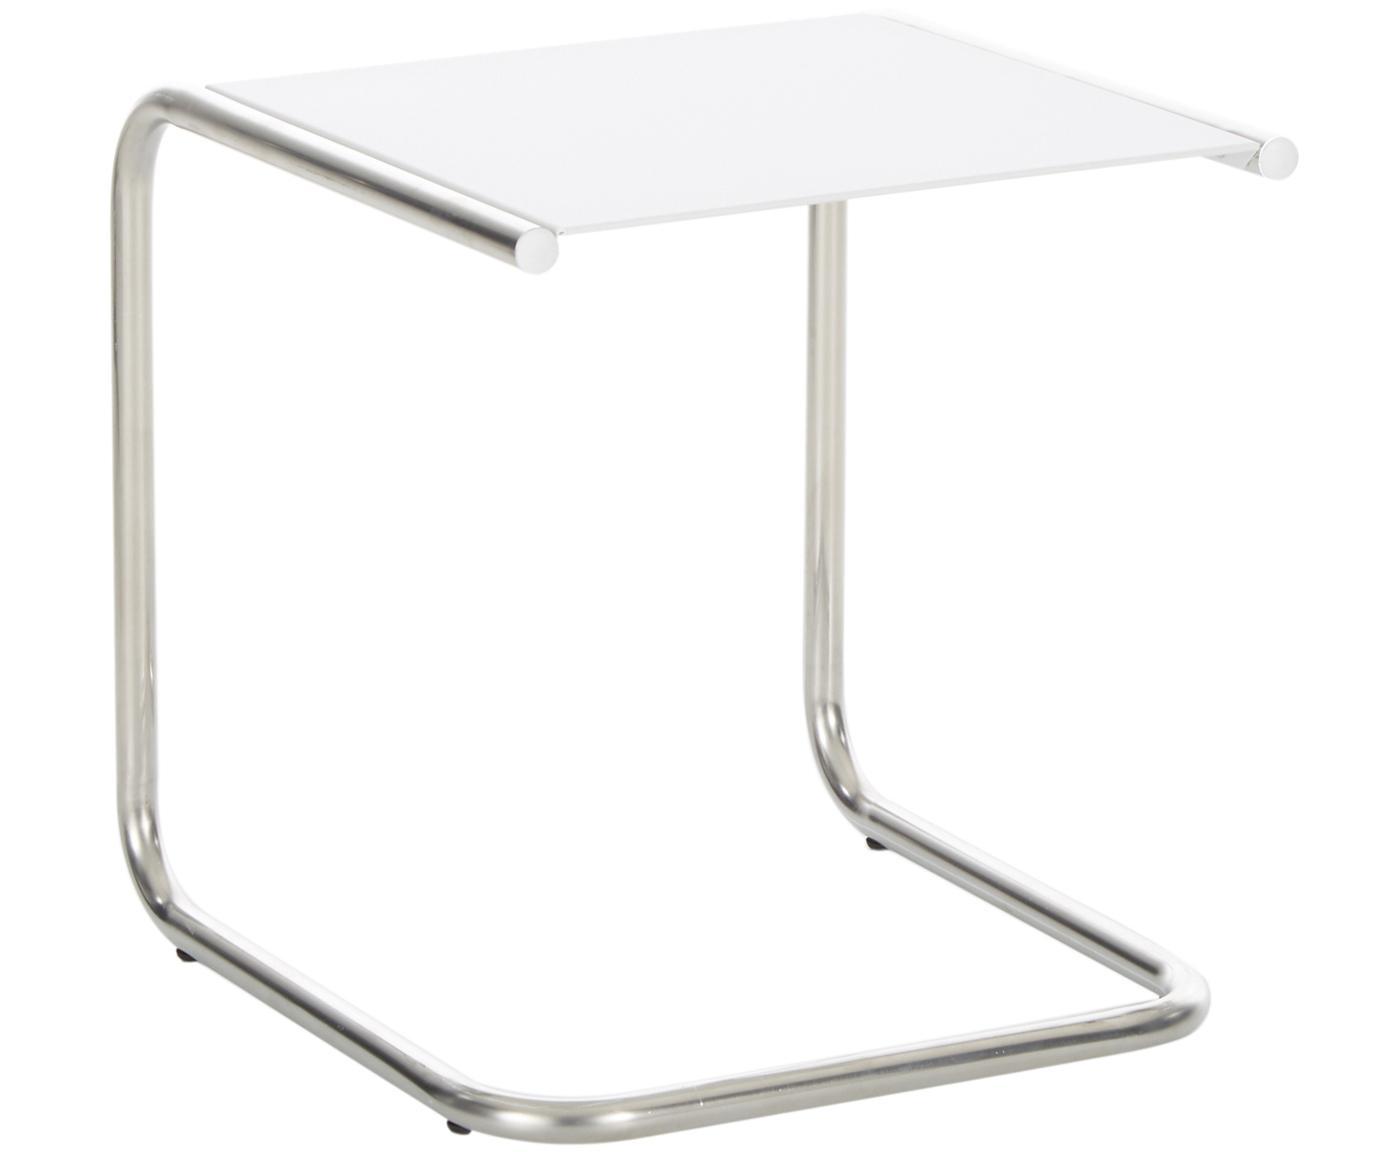 Mesa auxiliar de exterior de metal Club, Tablero: metal con pintura en polv, Estructura: aluminio pulido, Blanco, aluminio, An 40 x F 40 cm